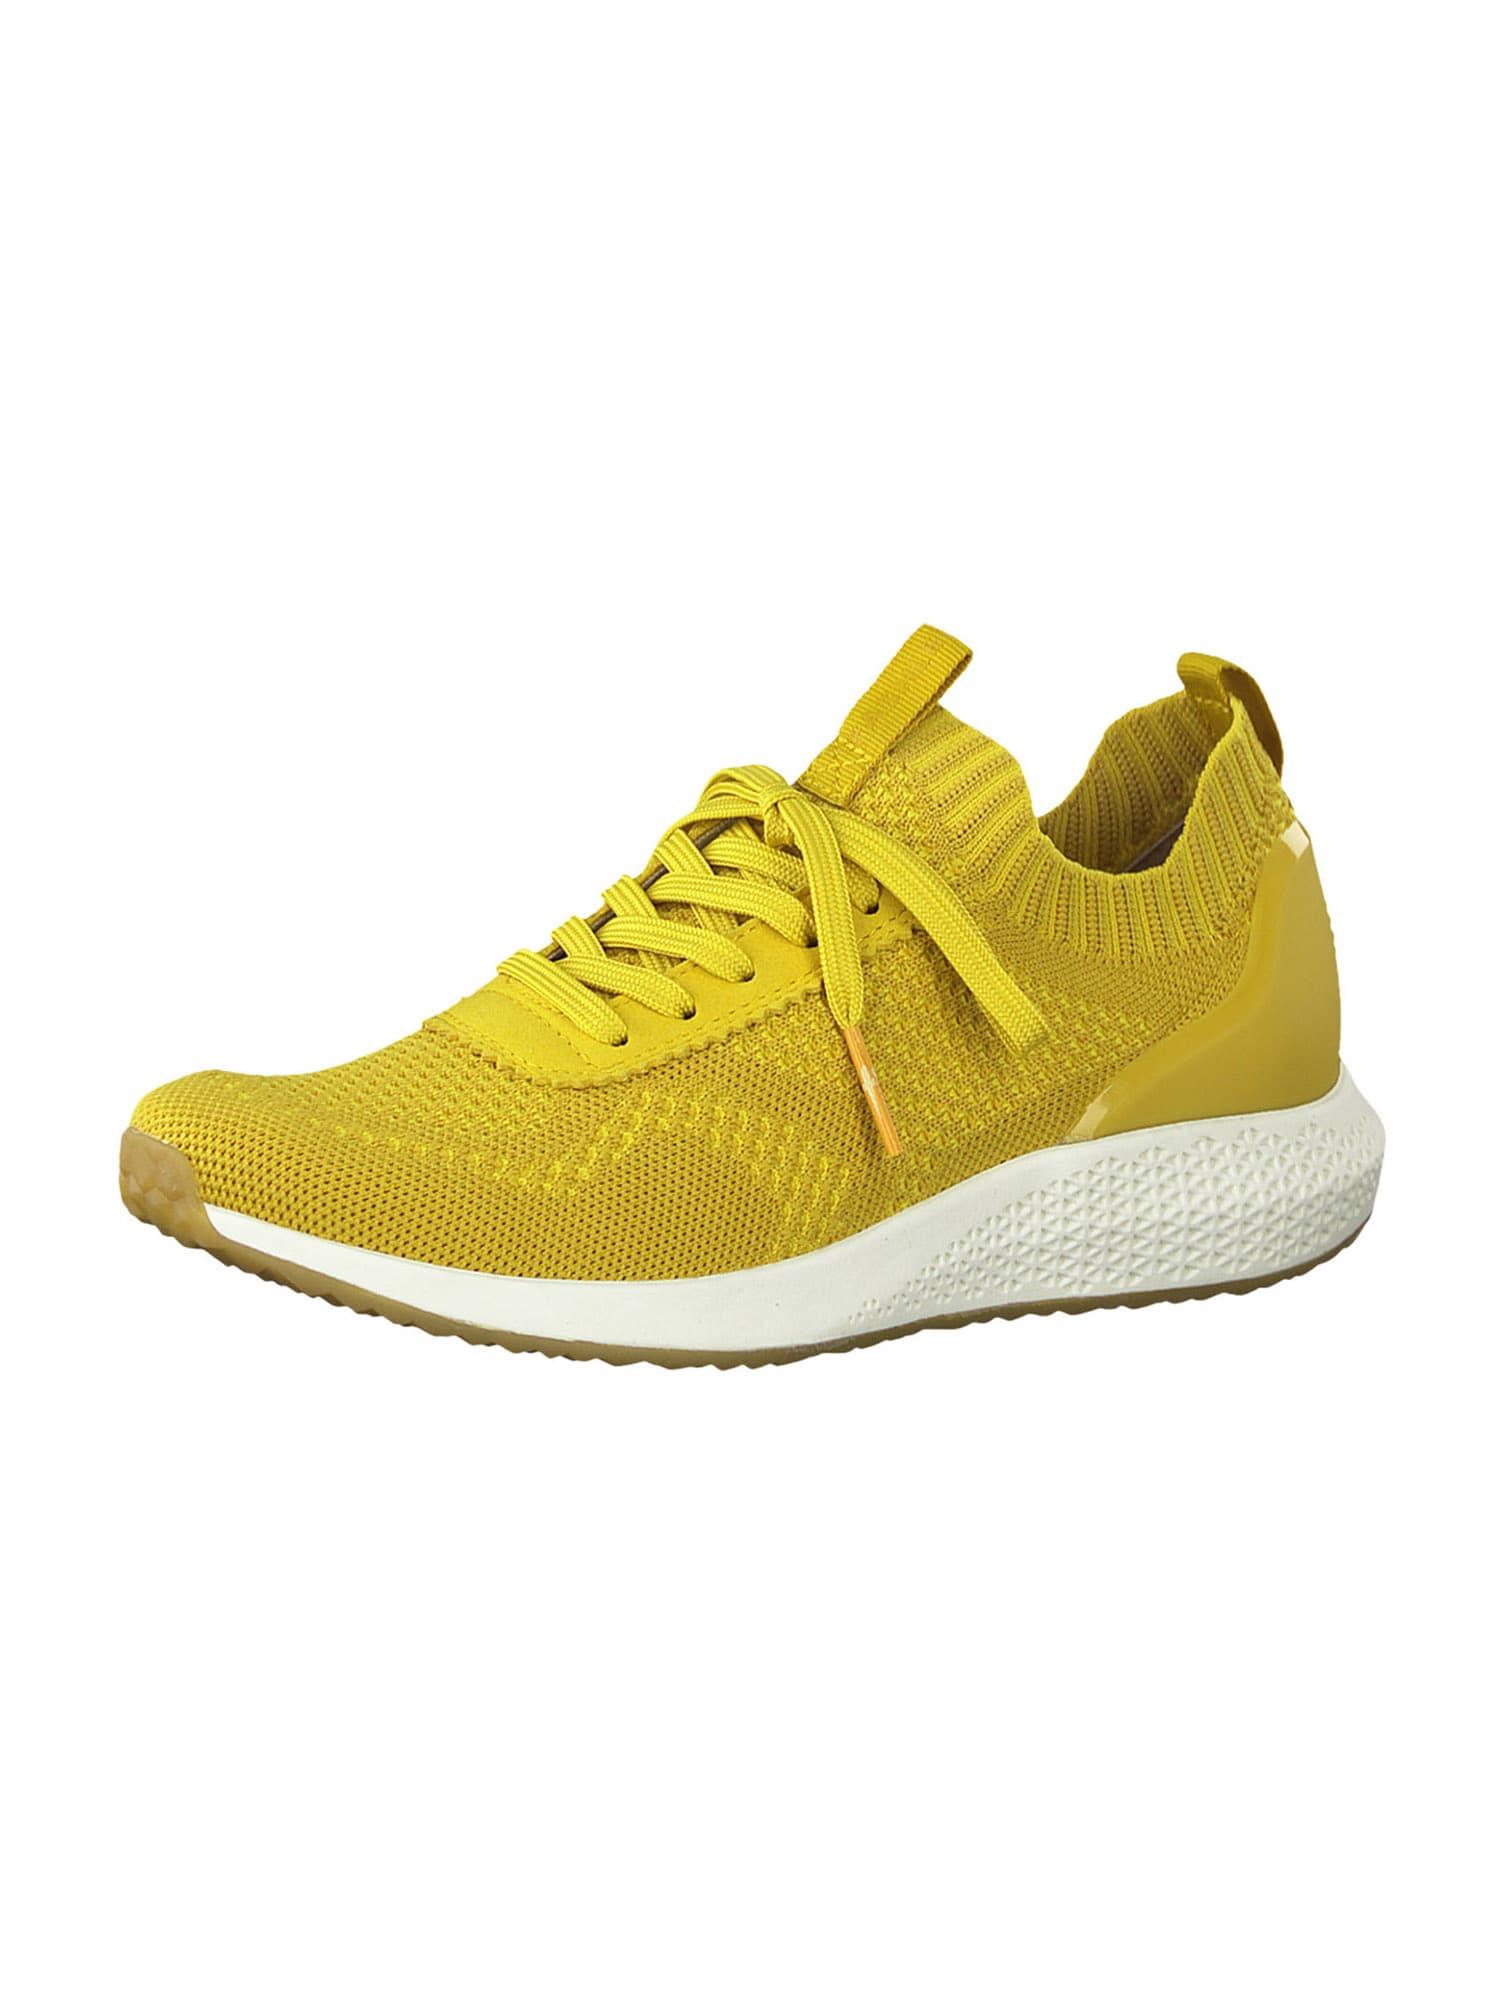 Tamaris Fashletics Sneaker geltona